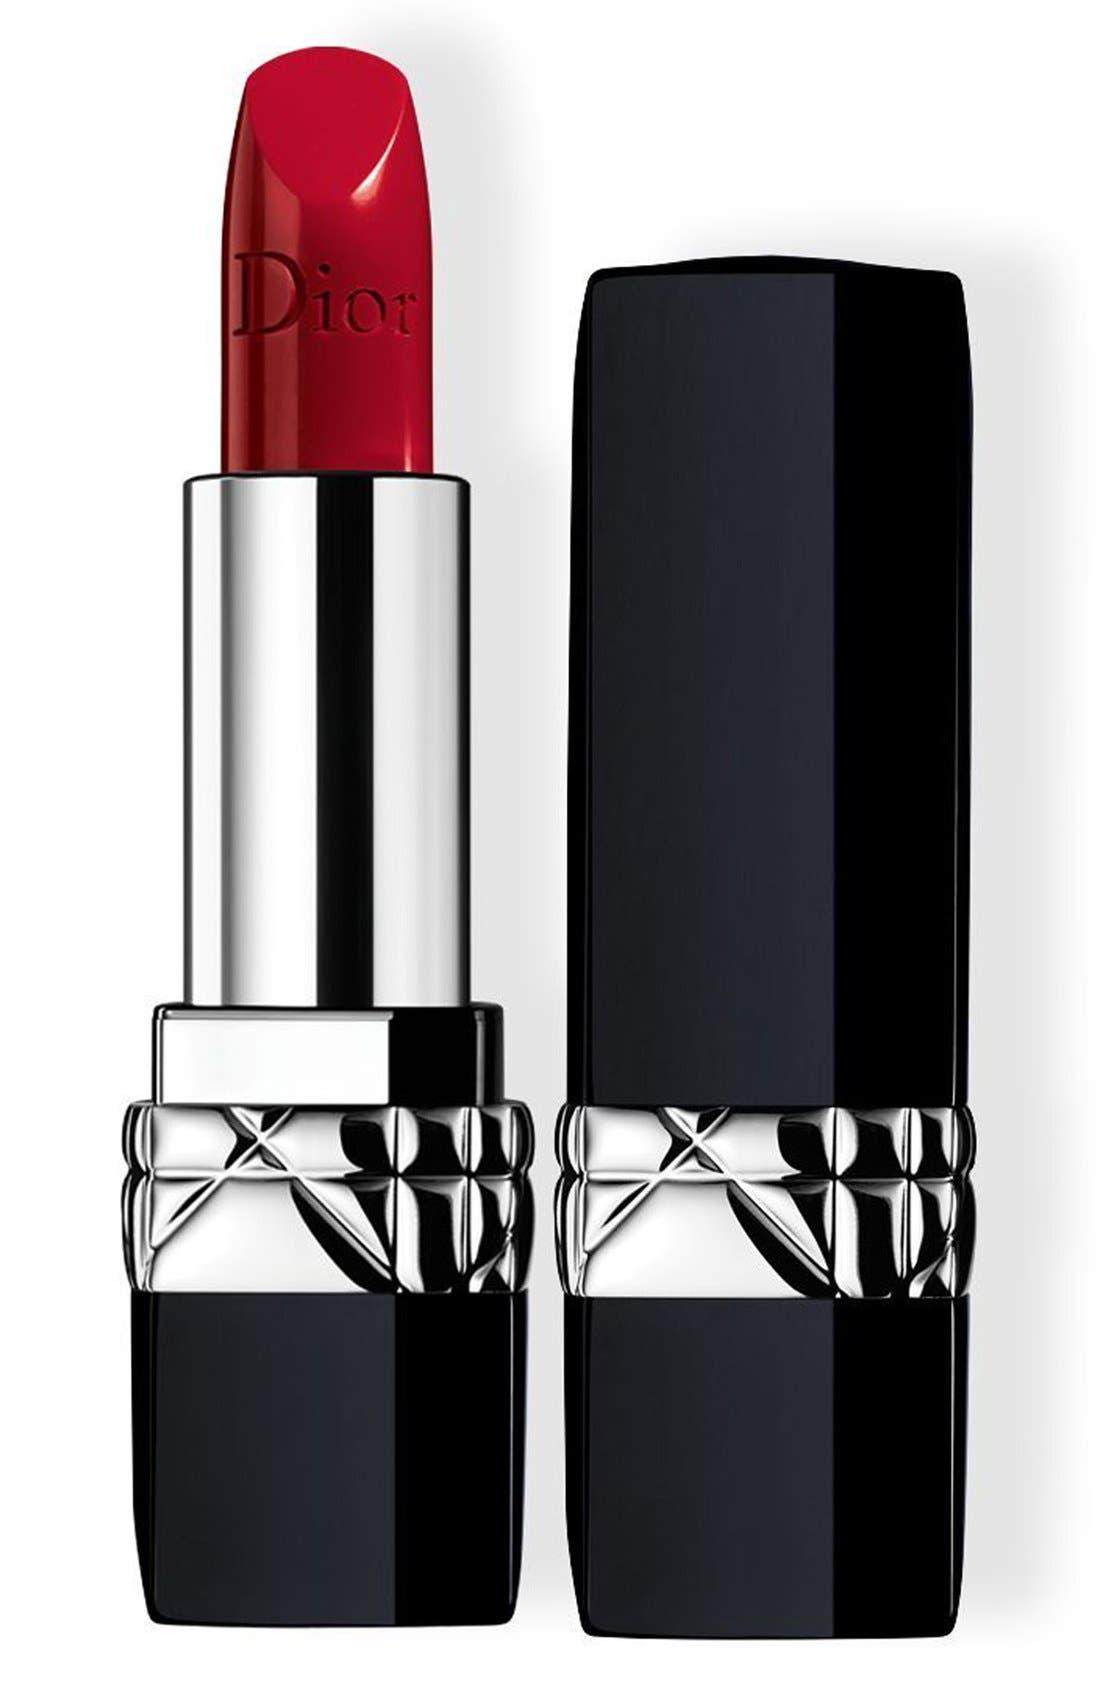 Dior Couture Color Rouge Dior Lipstick - 852 Plaza